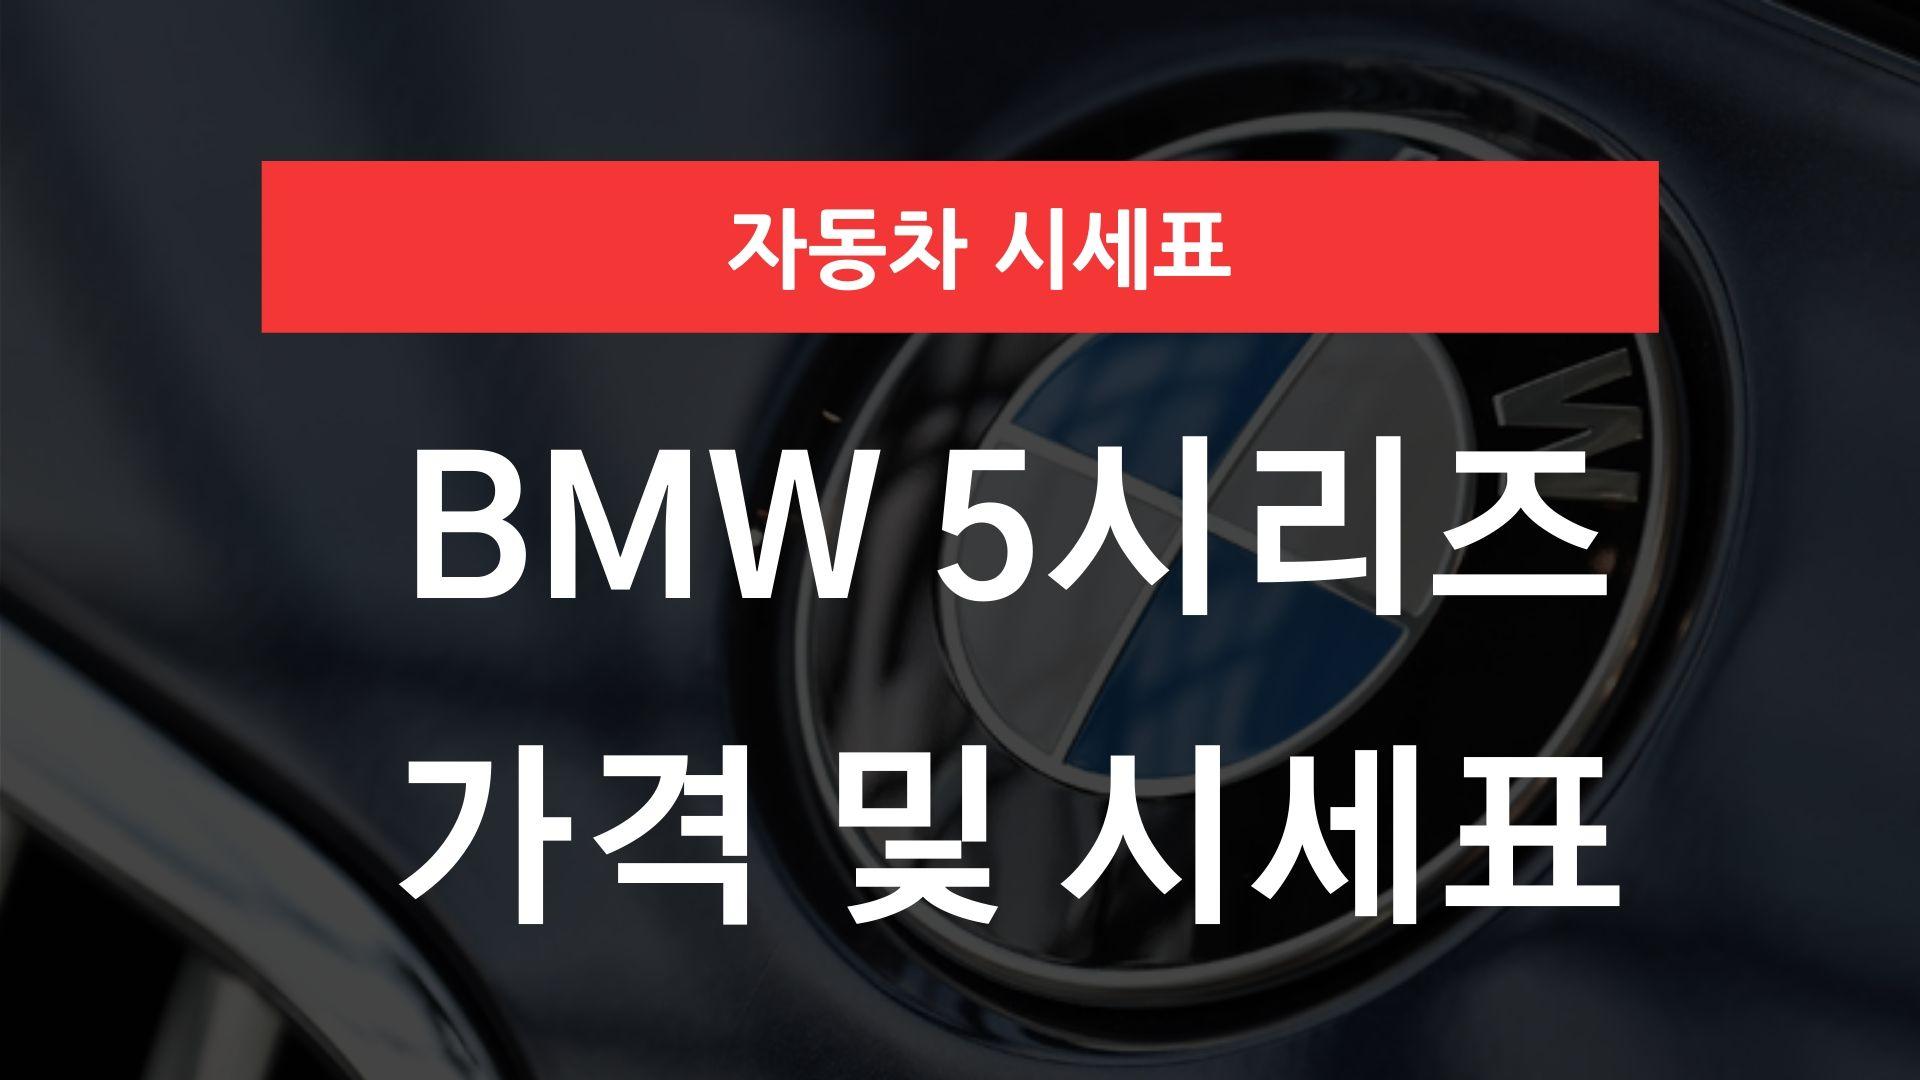 BMW 5시리즈 가격